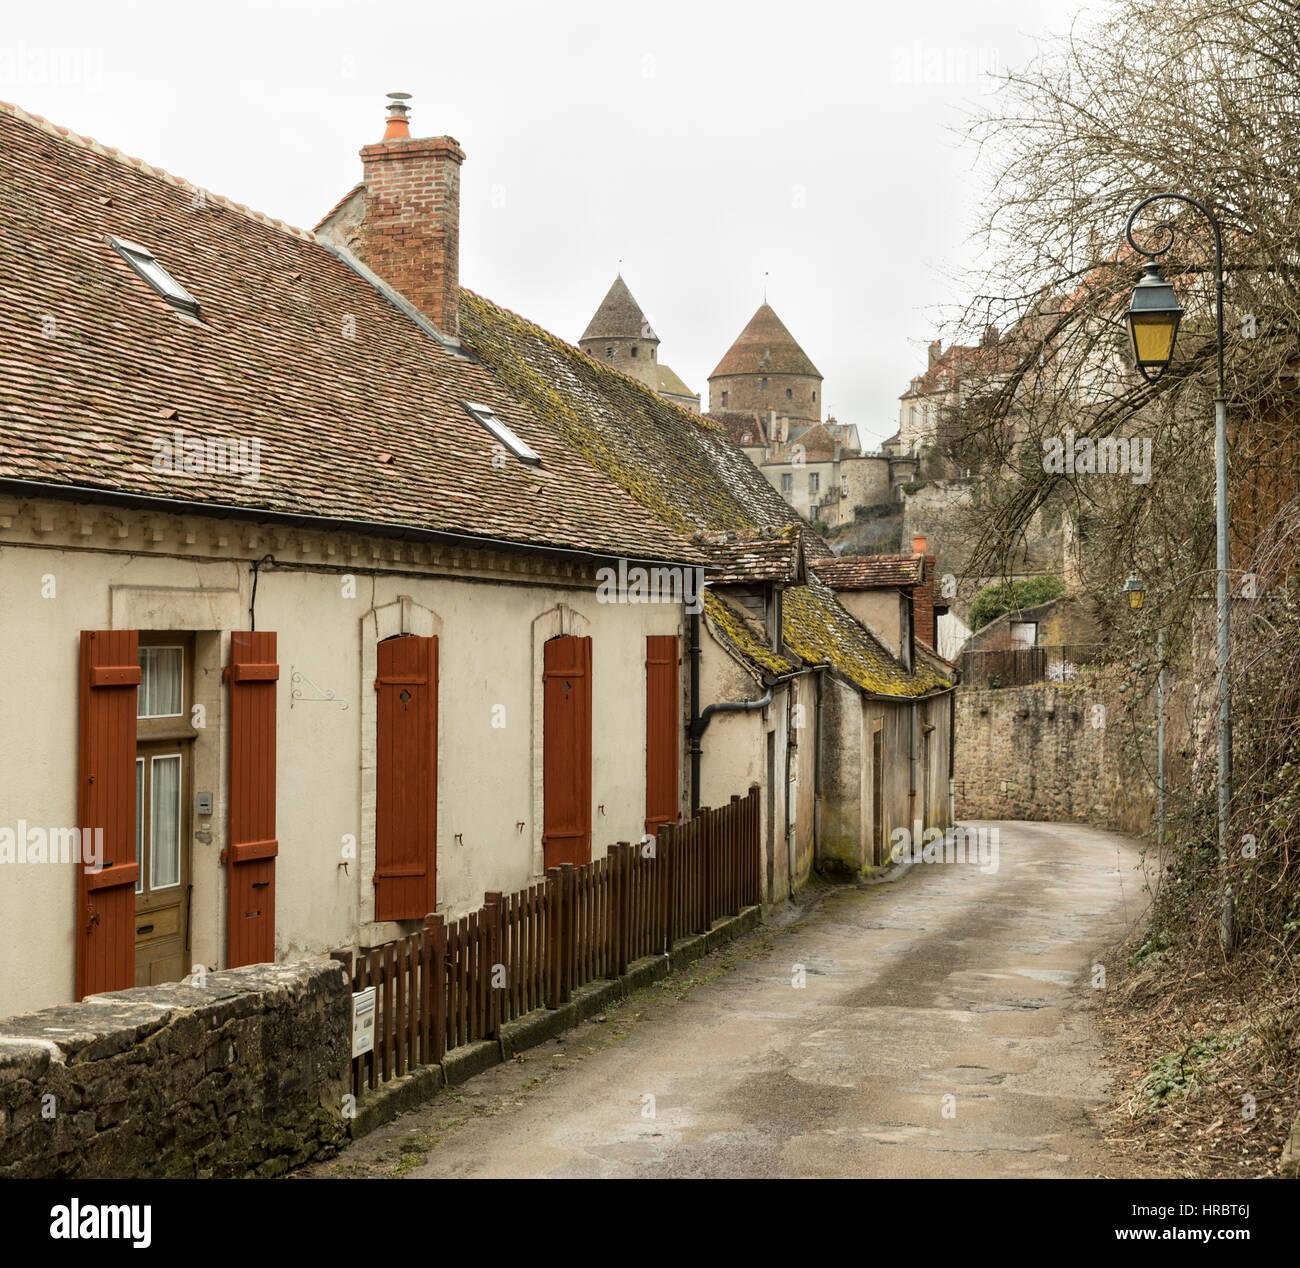 Old houses below the turreted walls of Semur-en-Auxois, Burgundy, France - Stock Image